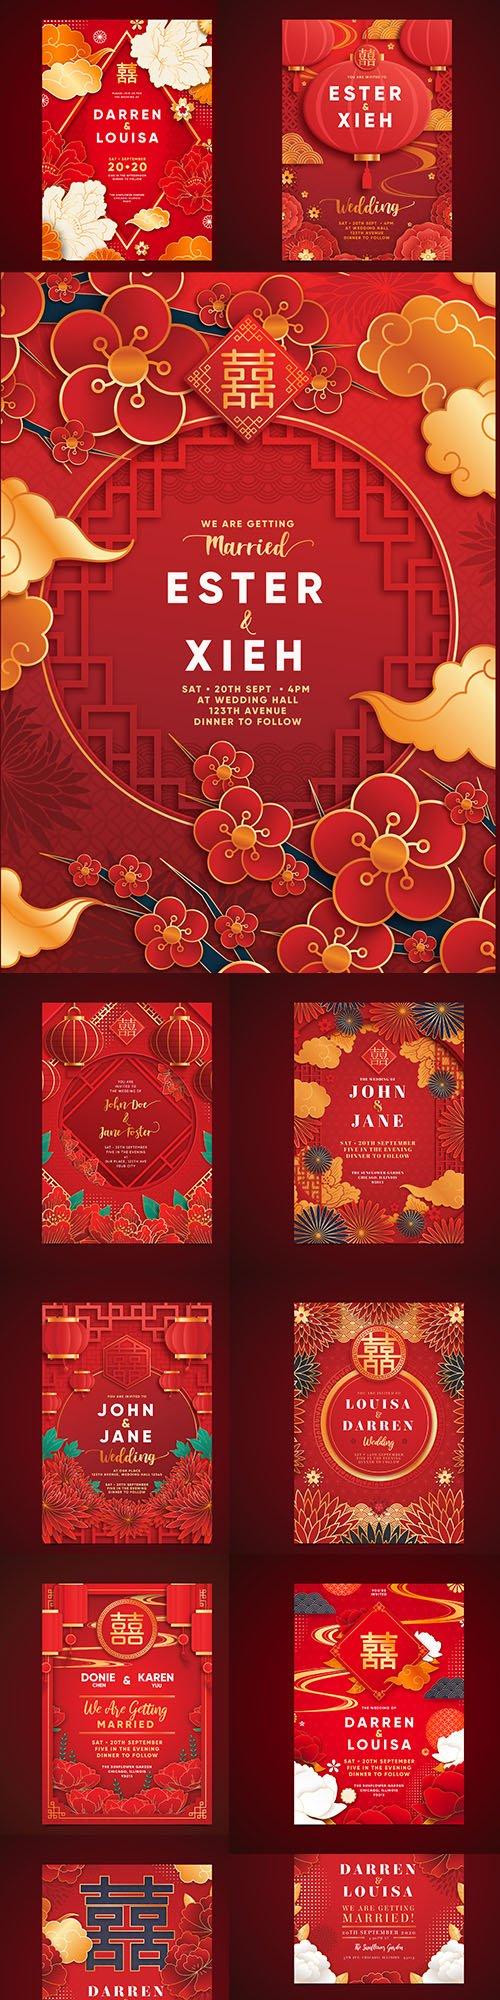 Chinese style wedding invitations realistic design